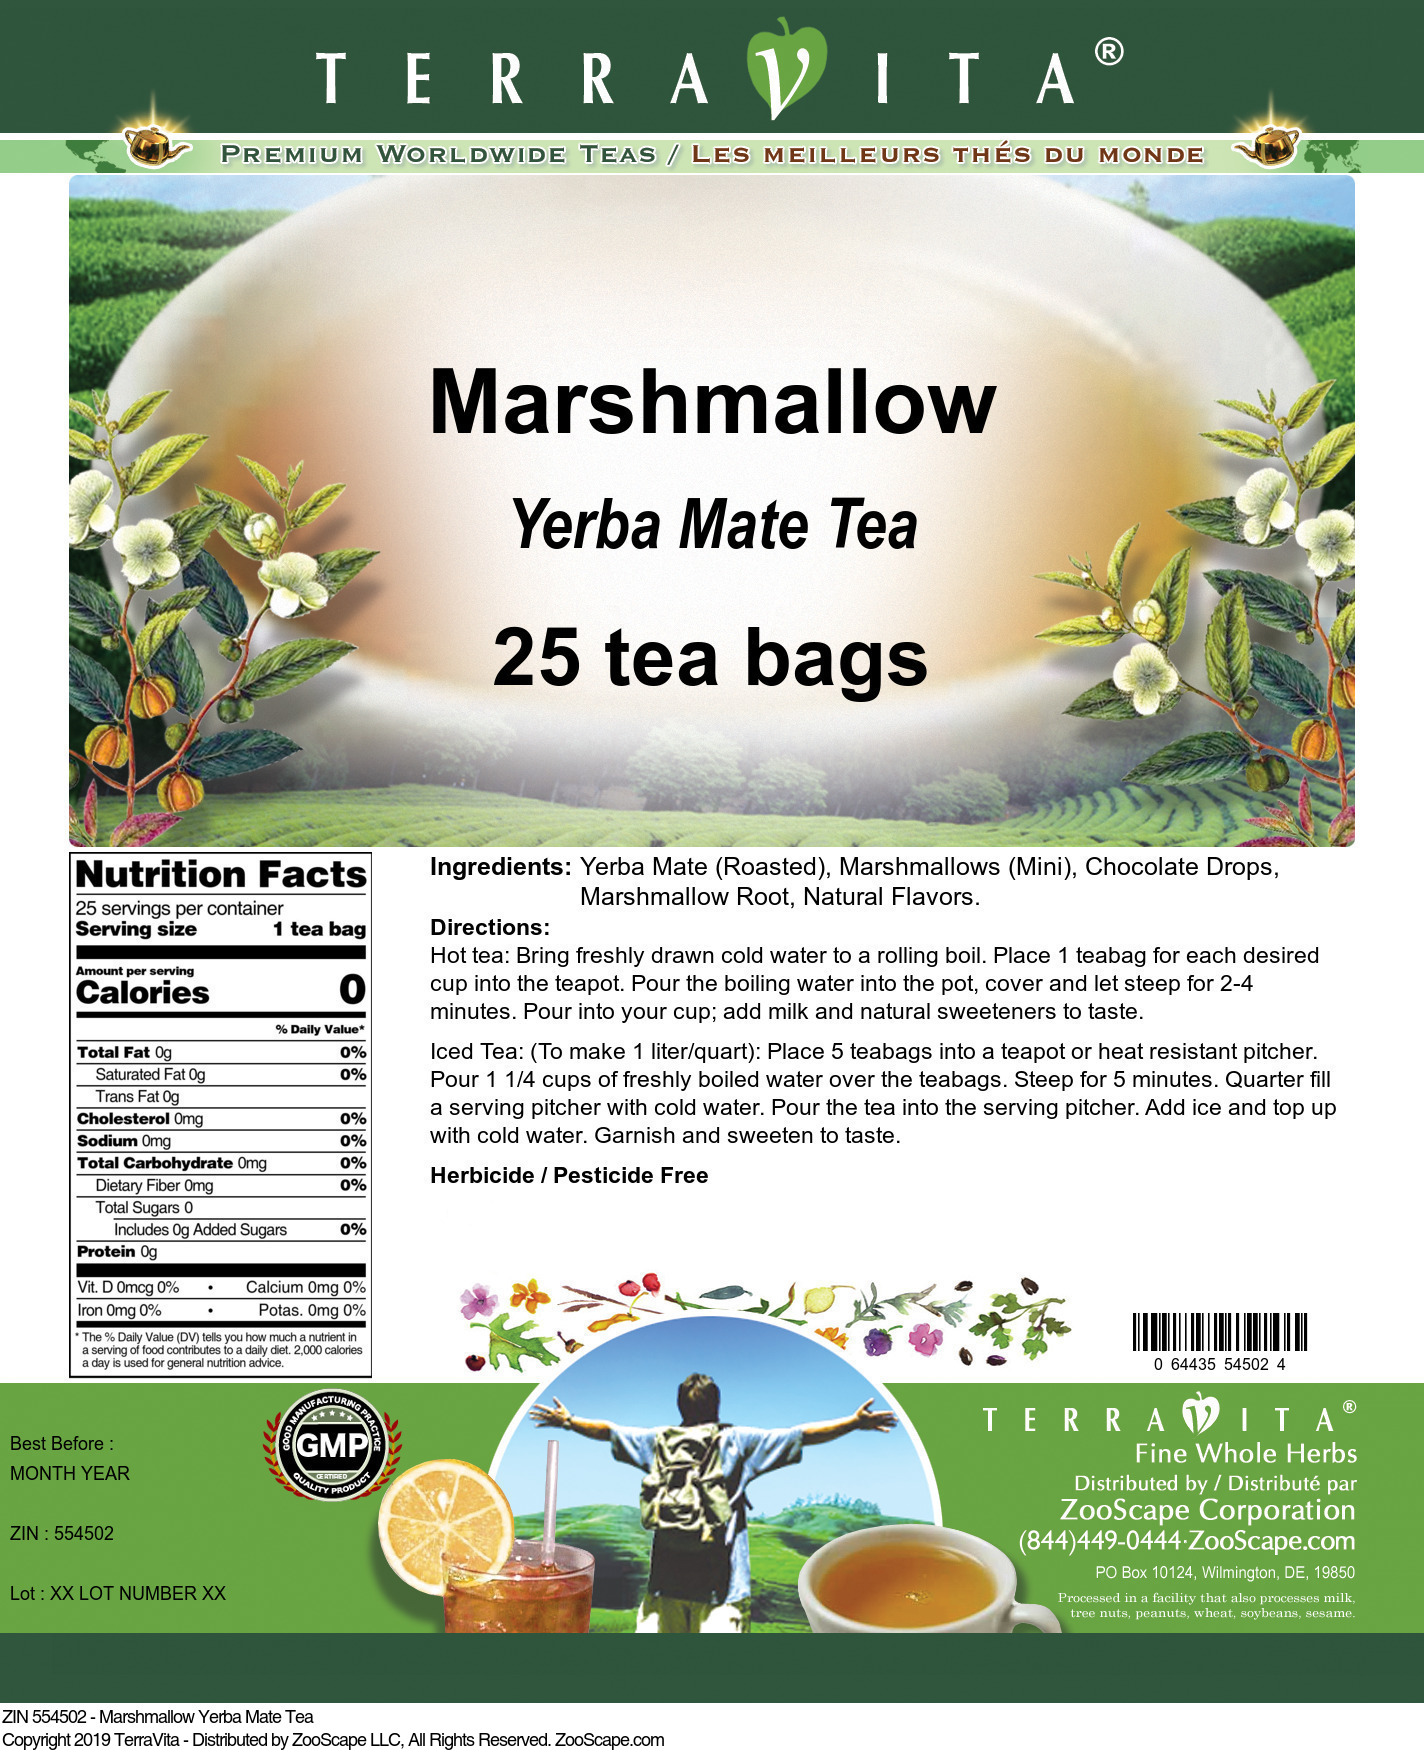 Marshmallow Yerba Mate